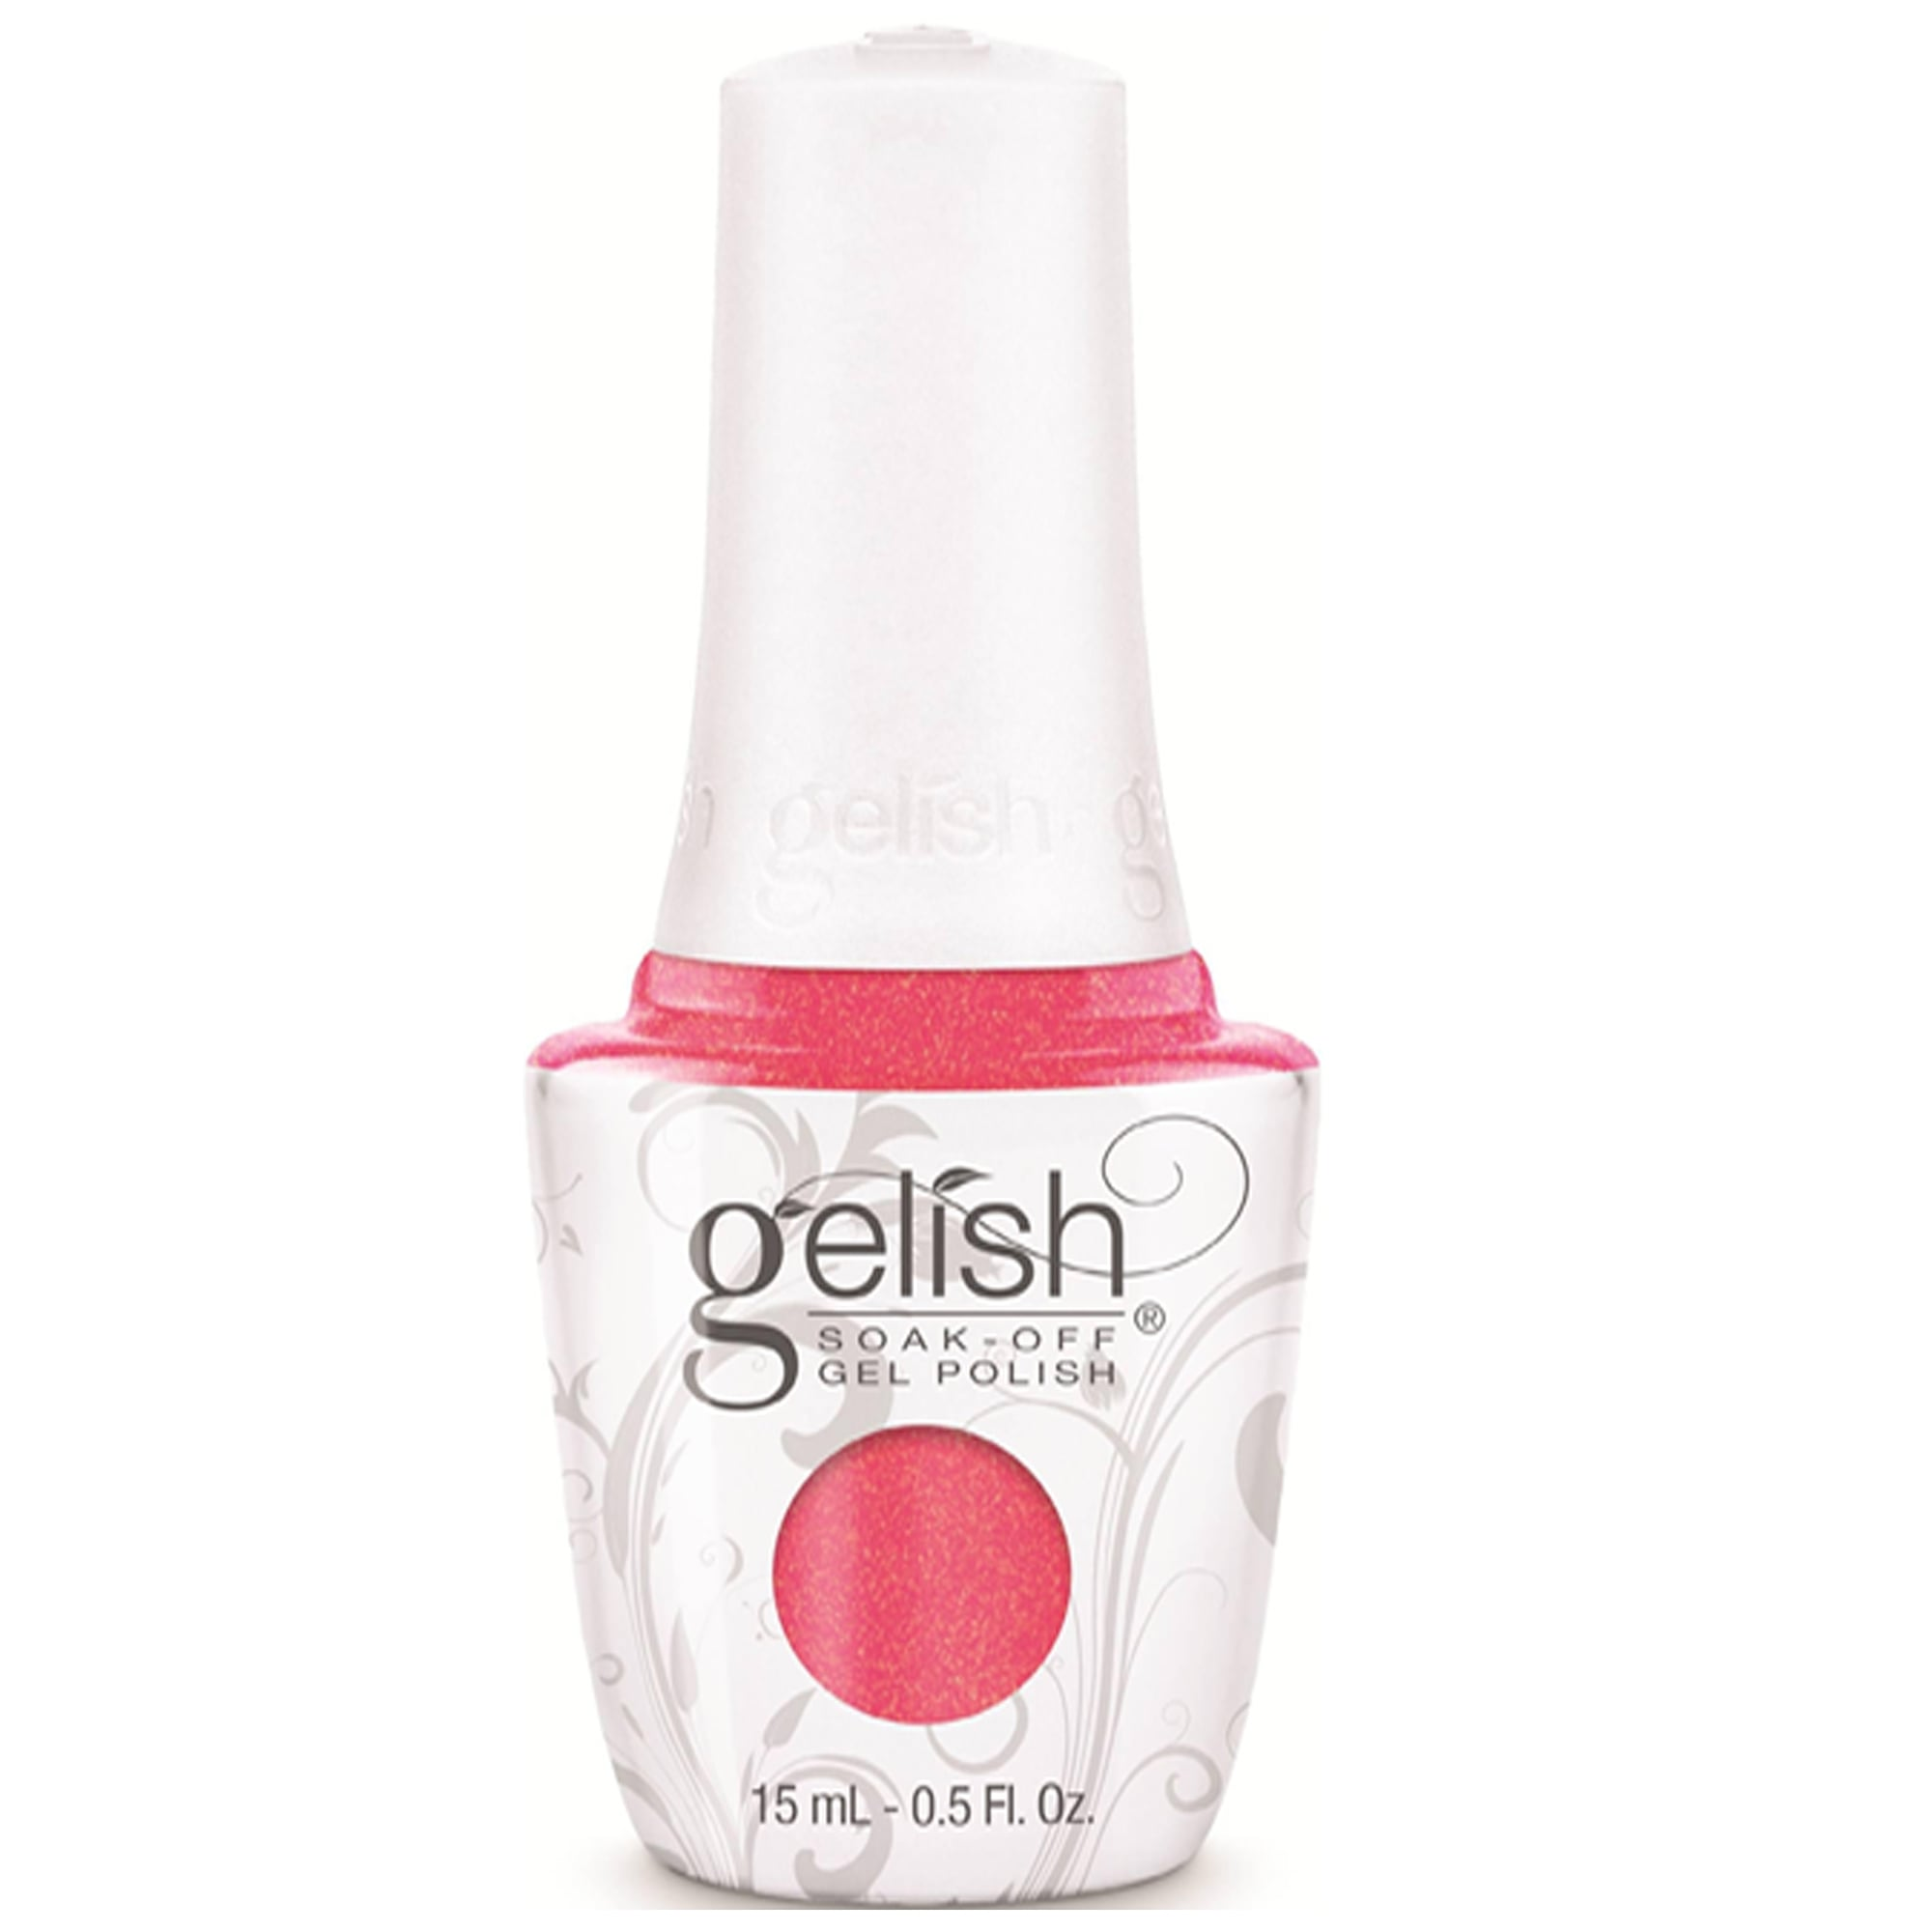 Gel Nail Polishes: Gelish Soak-Off Gel Nail Polish